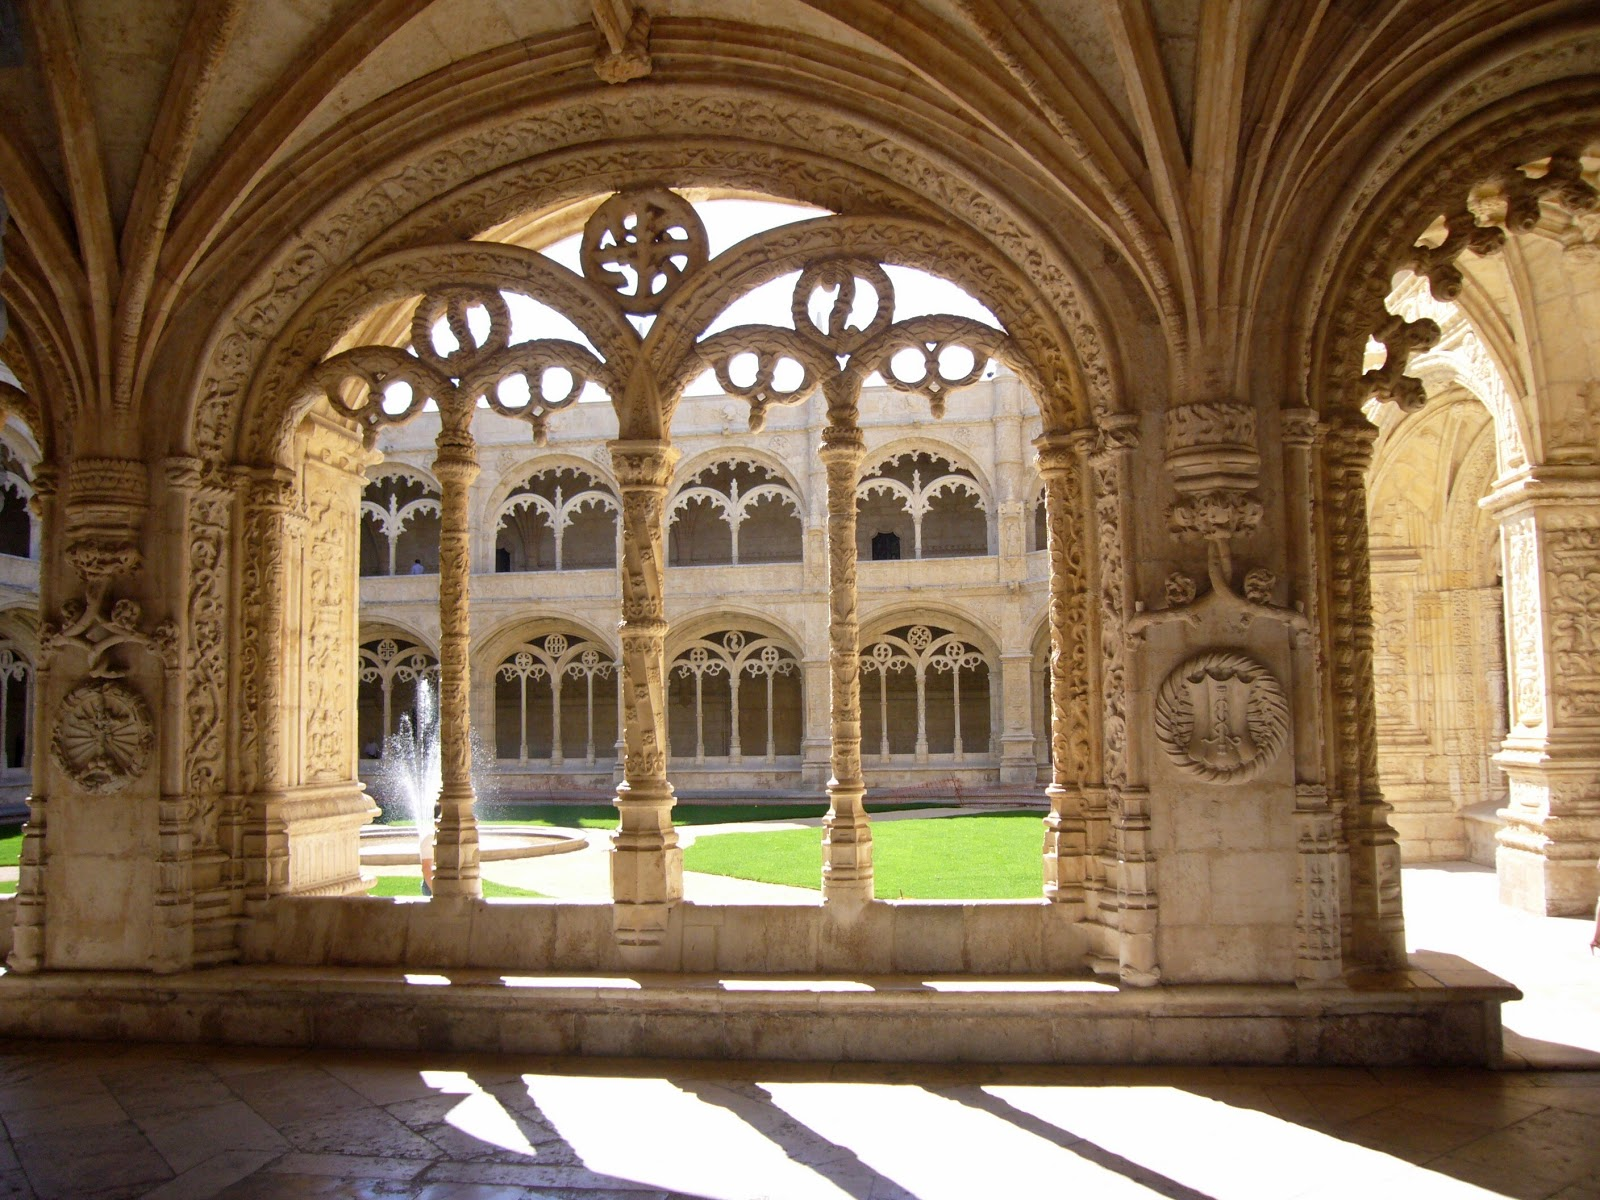 Mosteiro dos Jerónimos | Flickr - Photo Sharing!